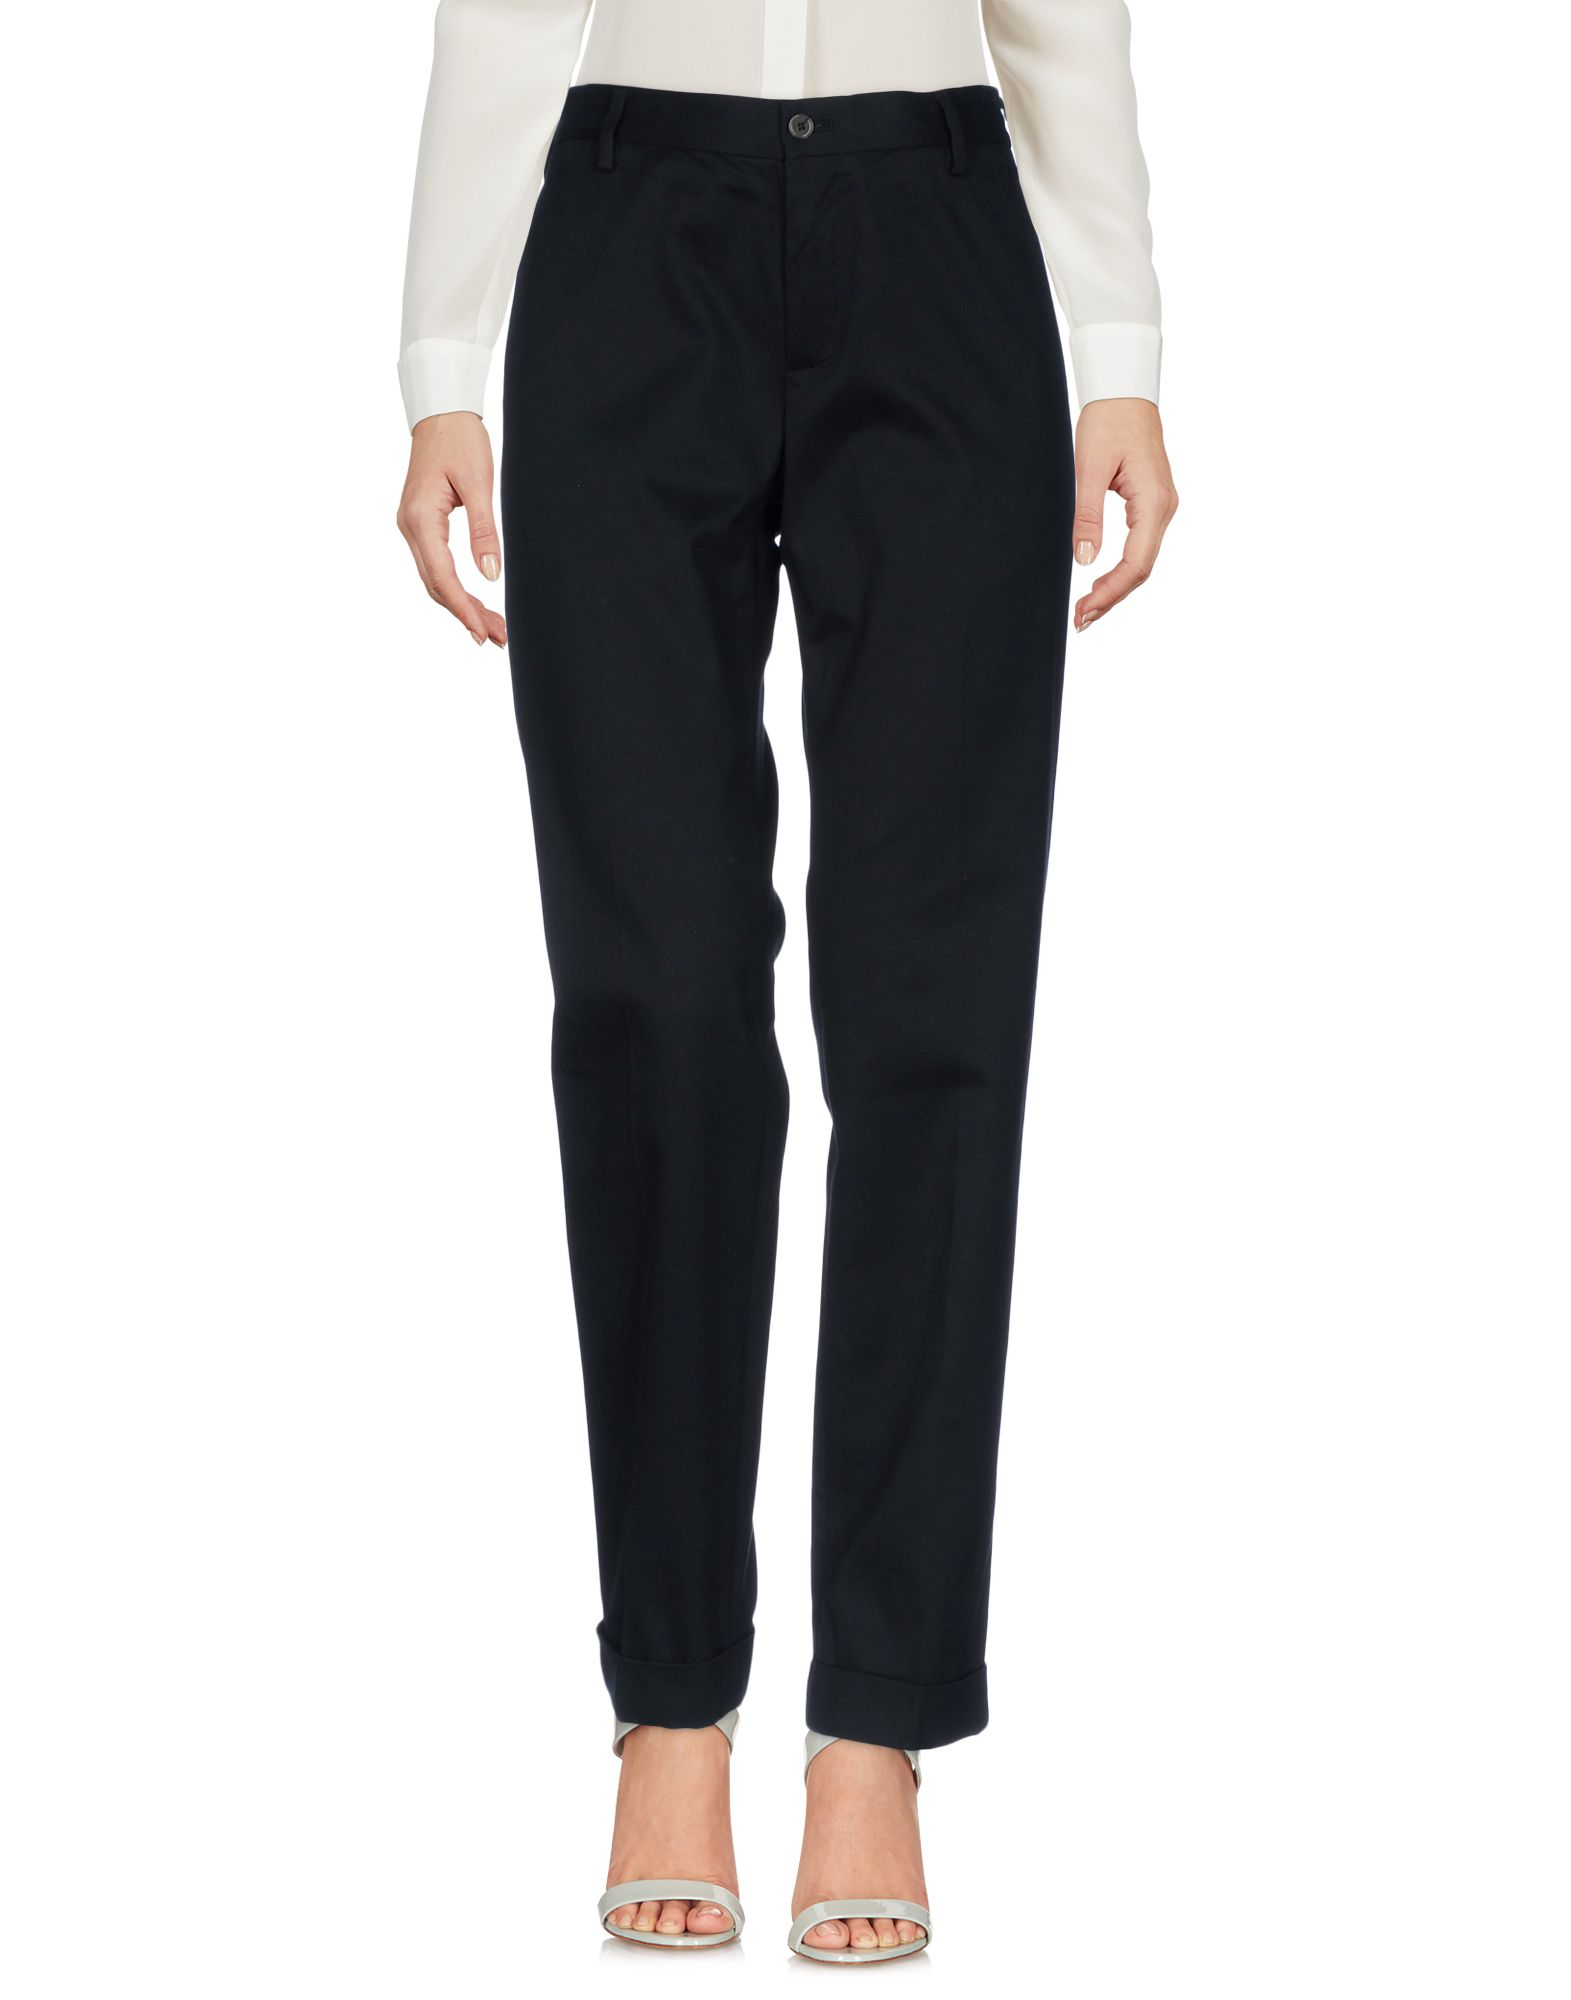 Pantalone Golden Goose Deluxe Brand Donna - Acquista online su LO6enW